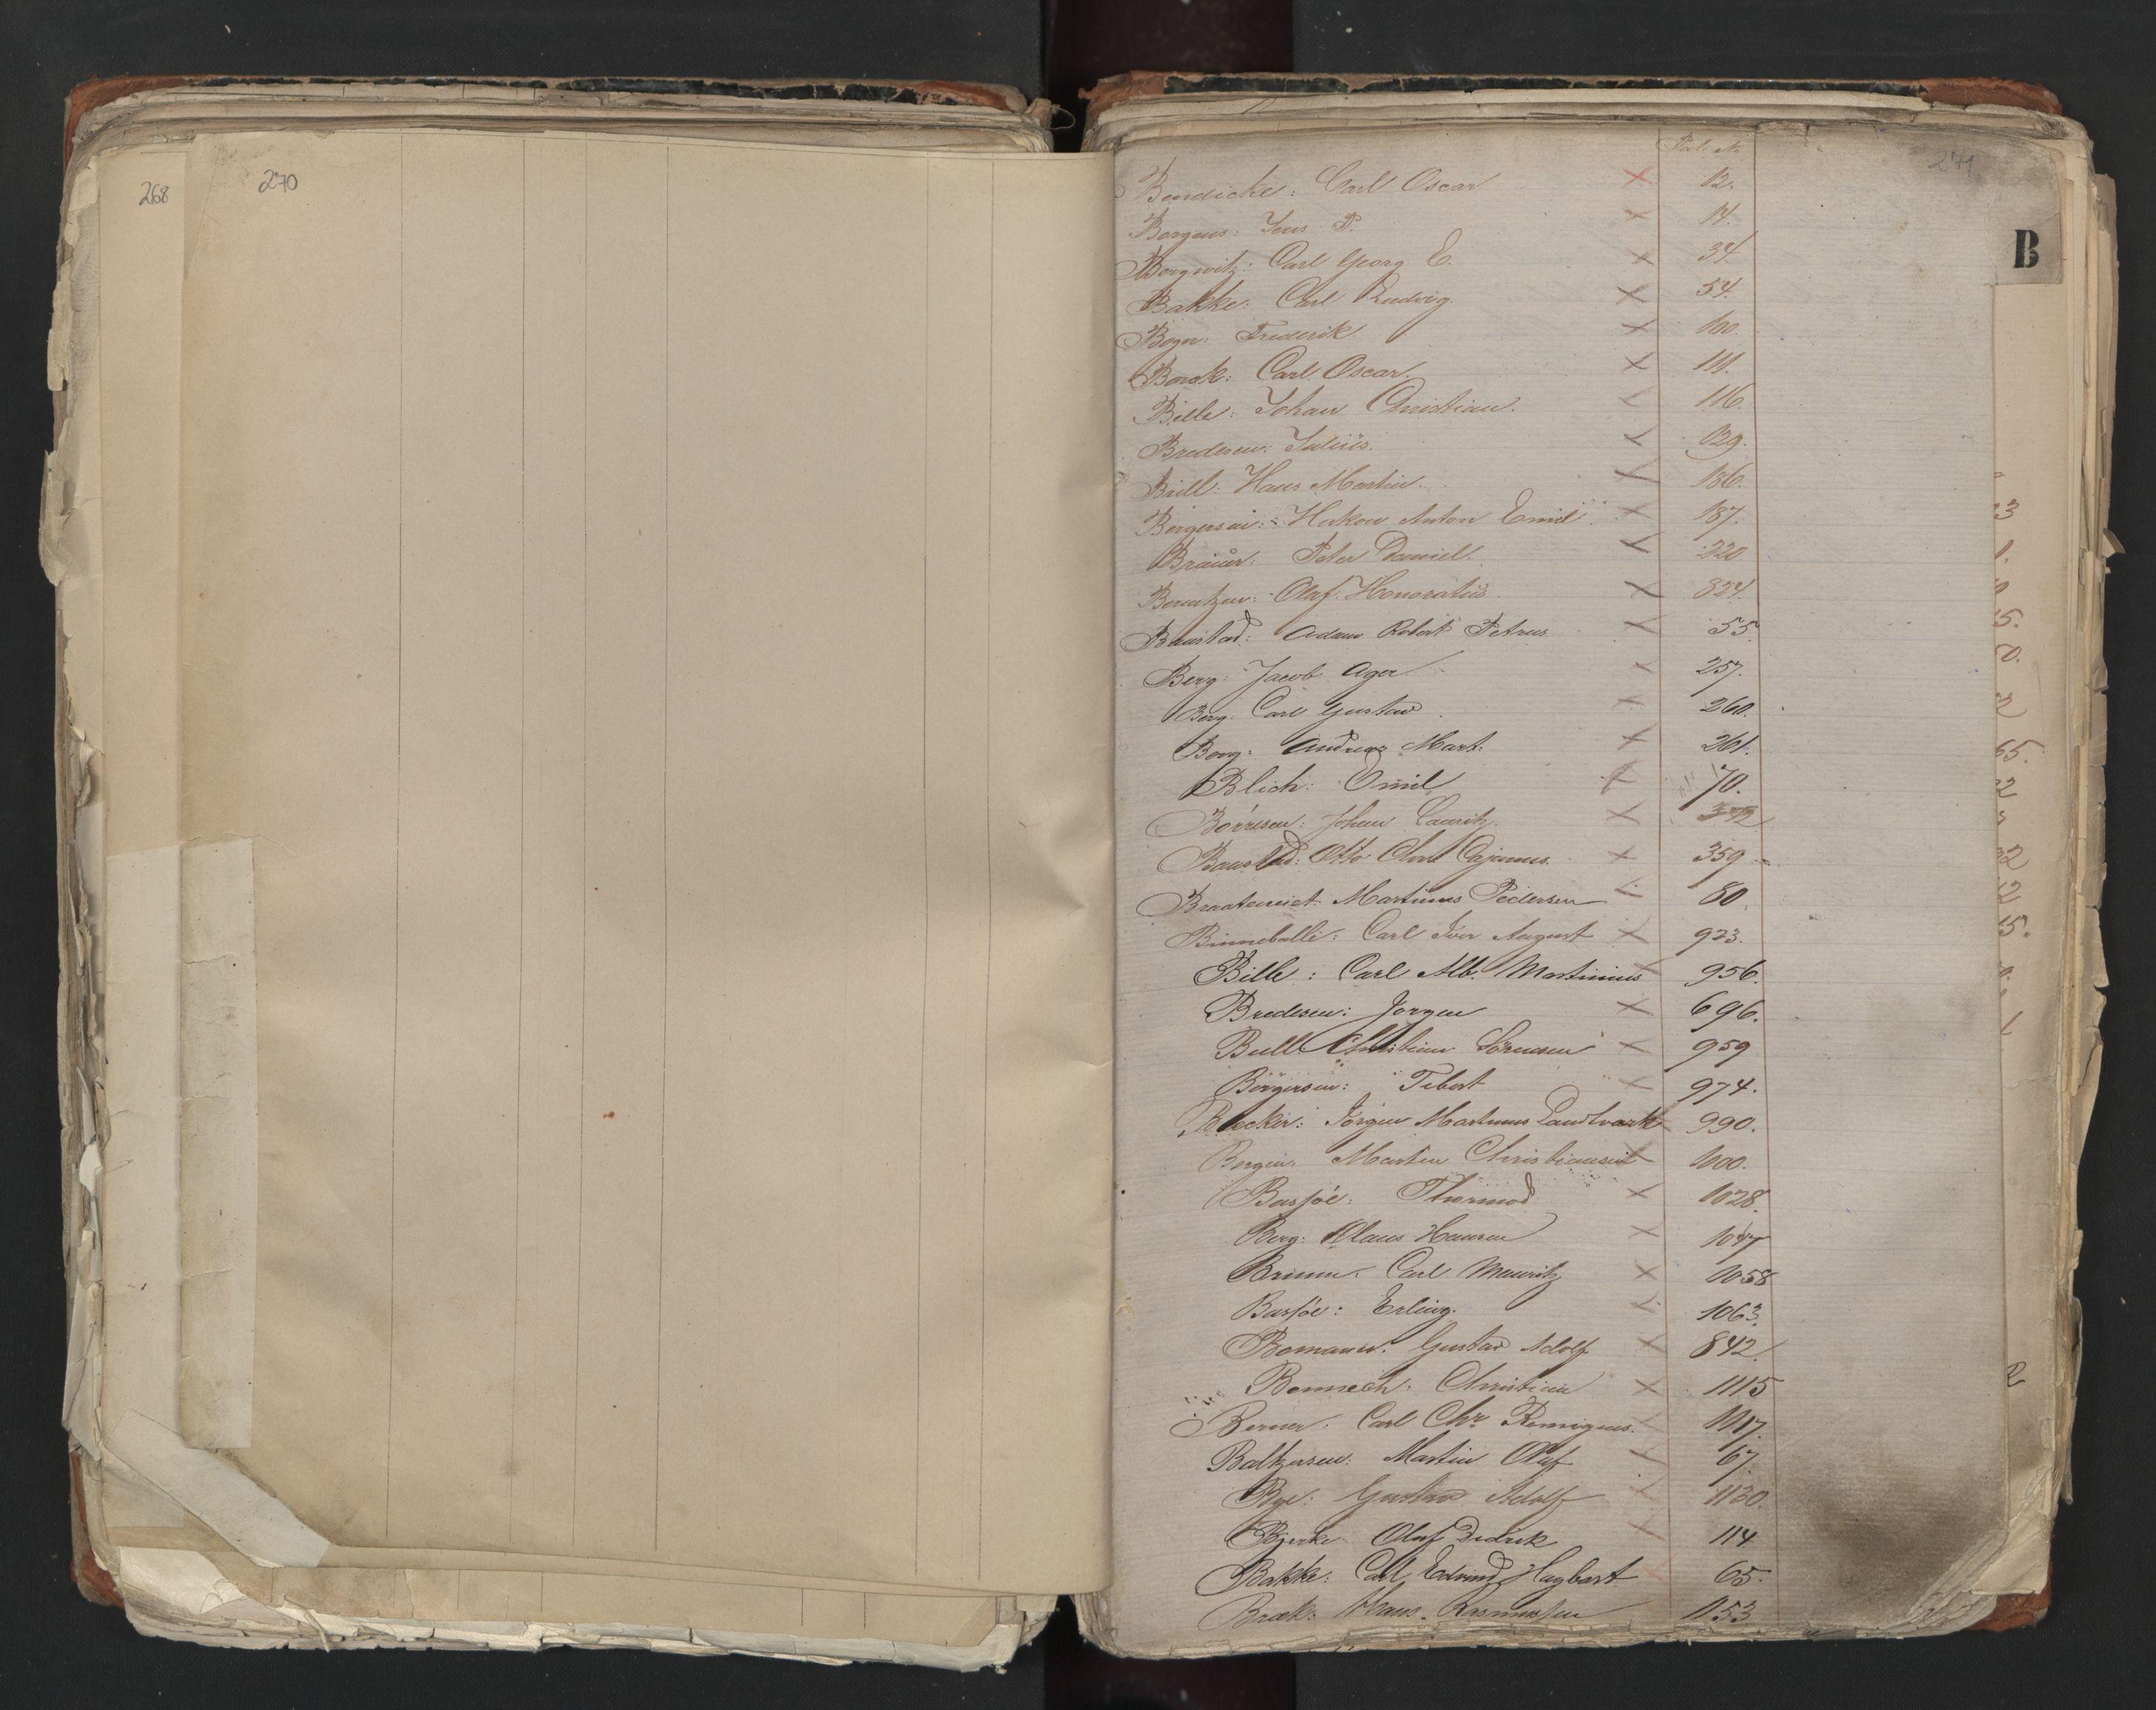 SAO, Oslo sjømannskontor, F/Fa/L0001: Register for Kristiania krets, 1866-1891, s. 270-271